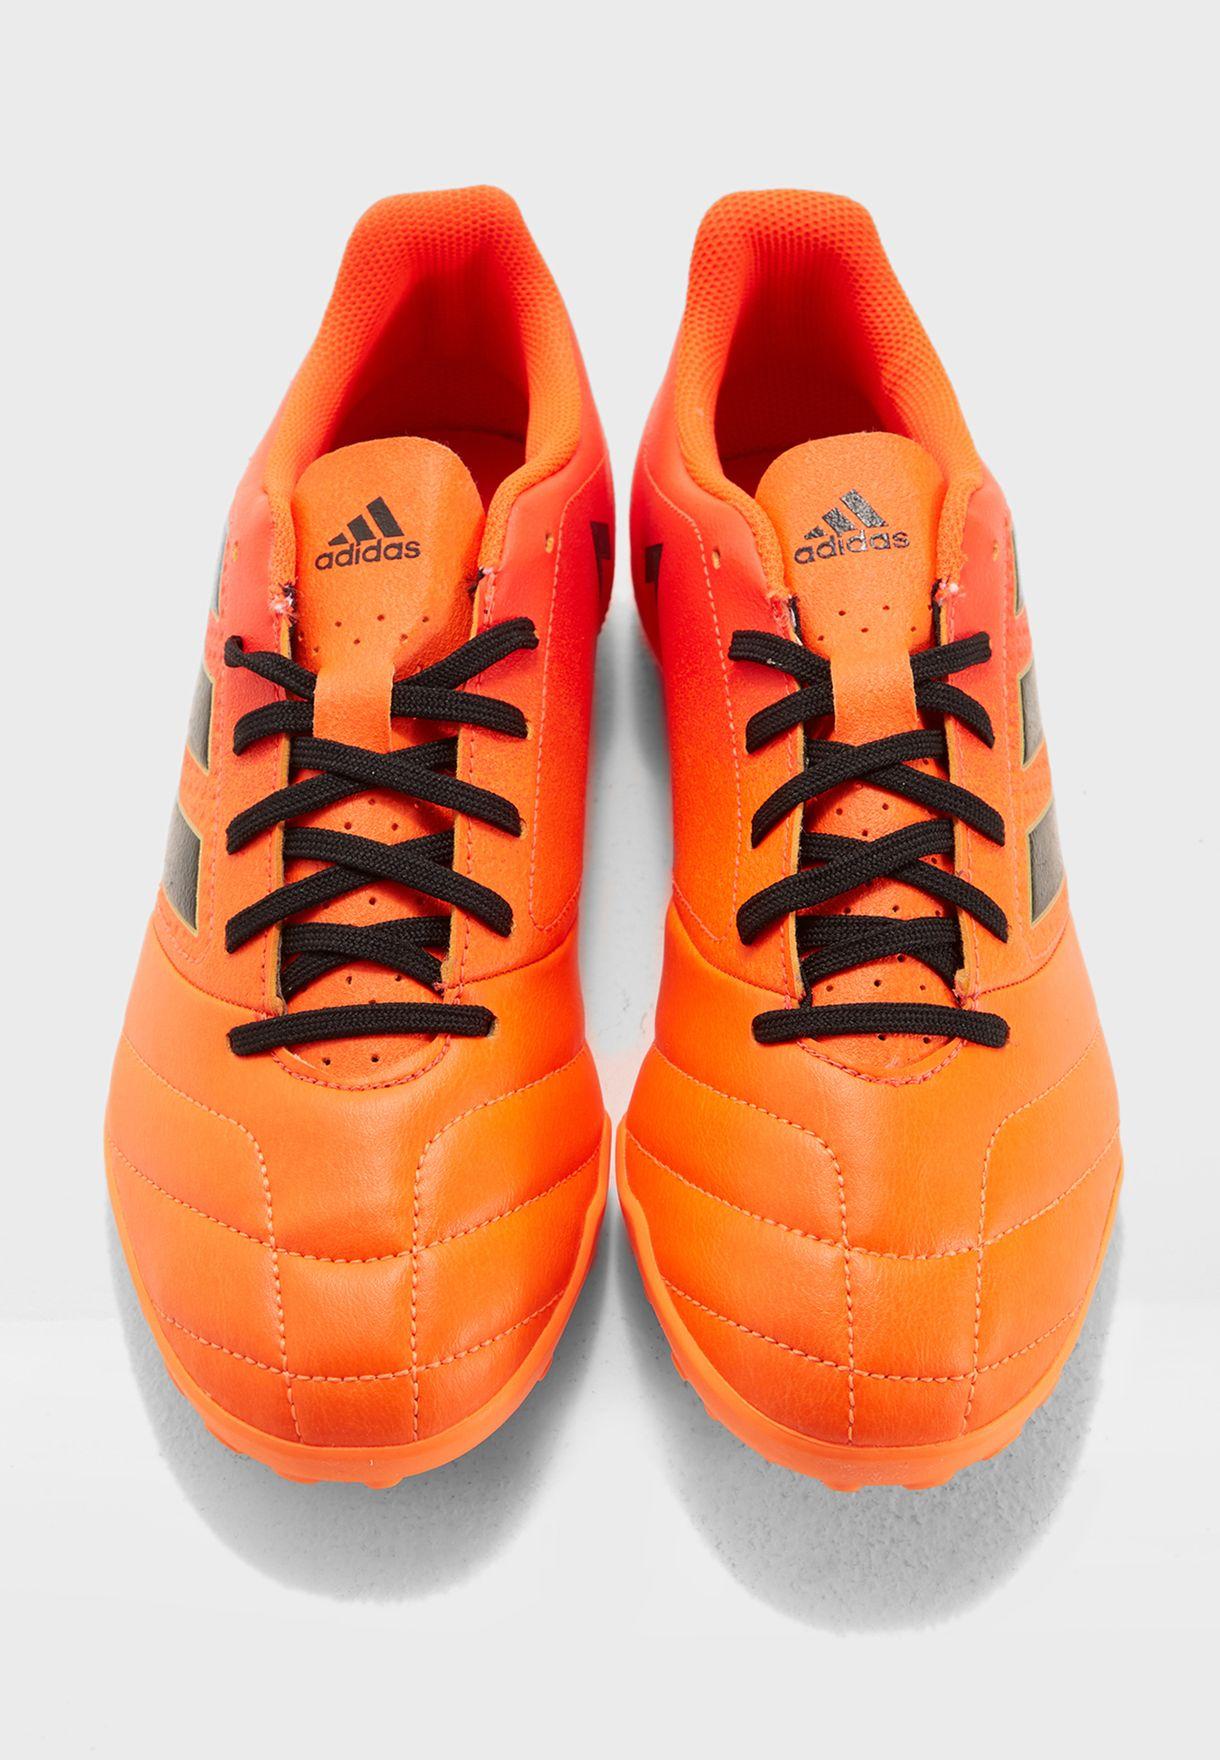 0ad5ed548425 Shop adidas orange Ace 17.4 TF S77115 for Men in UAE - AD476SH05YAC